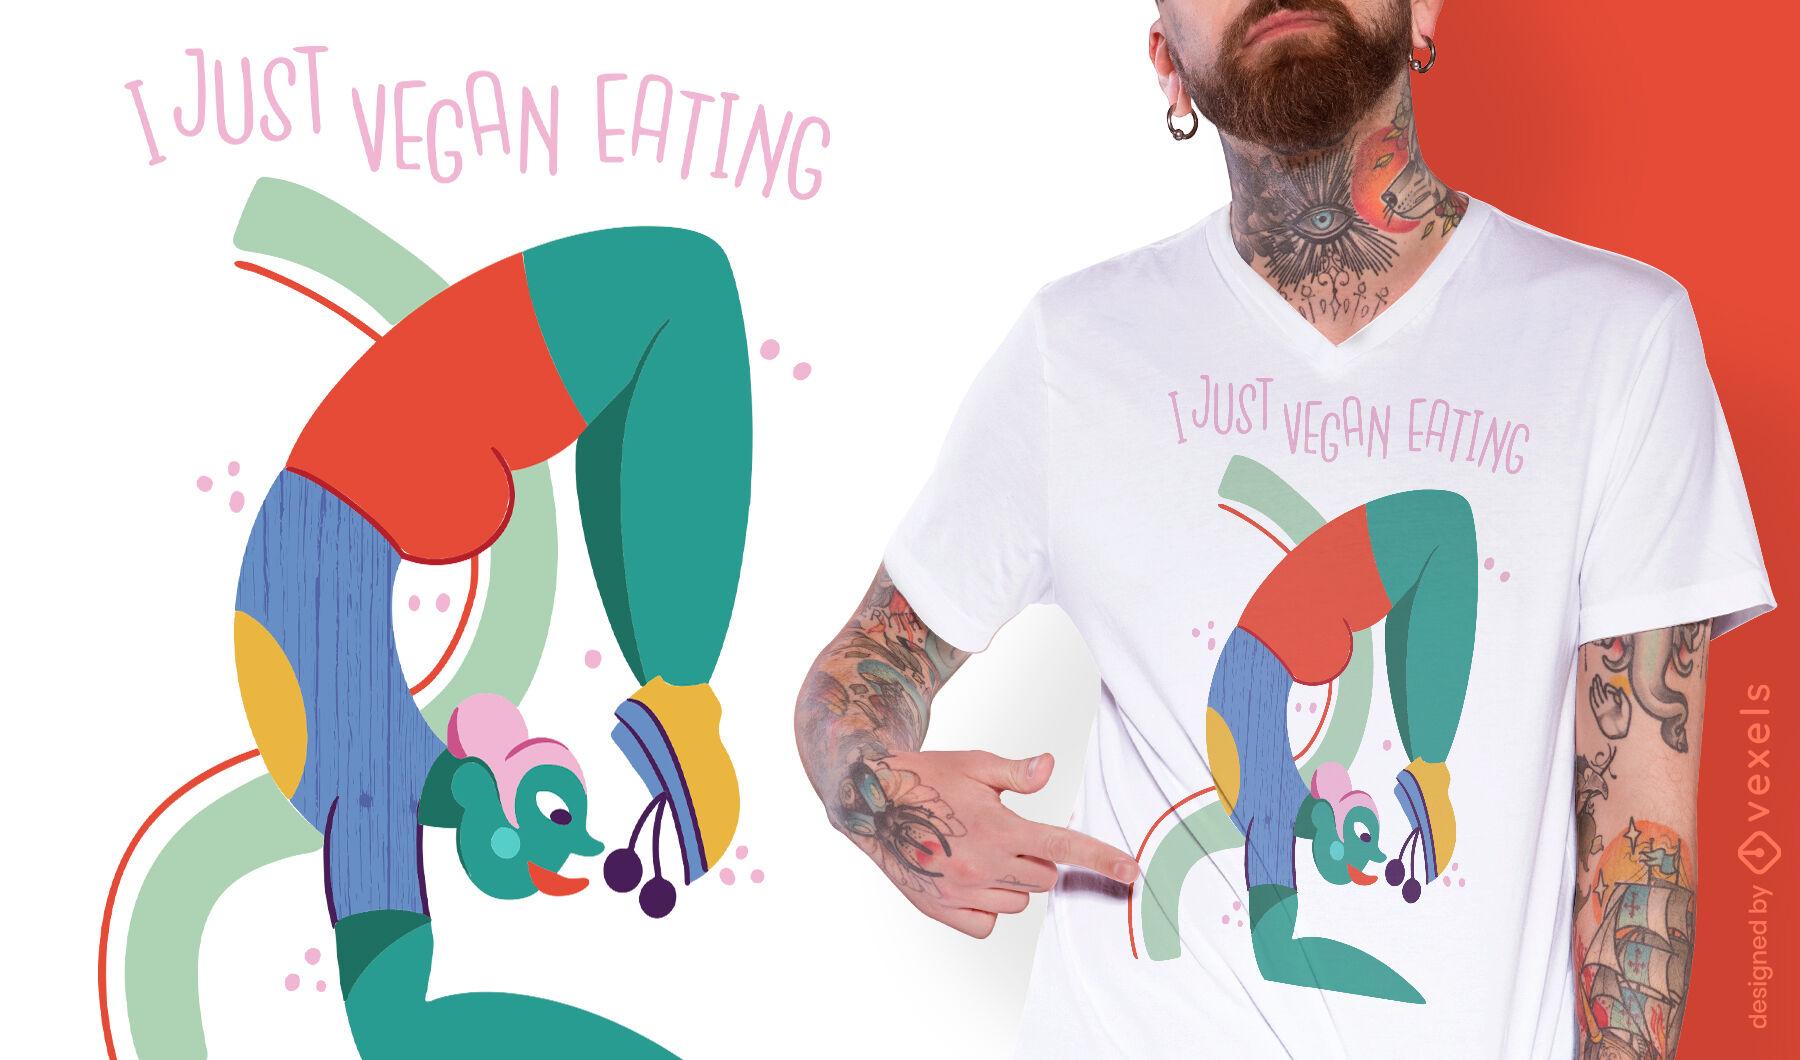 Diseño de camiseta vegana comiendo cita